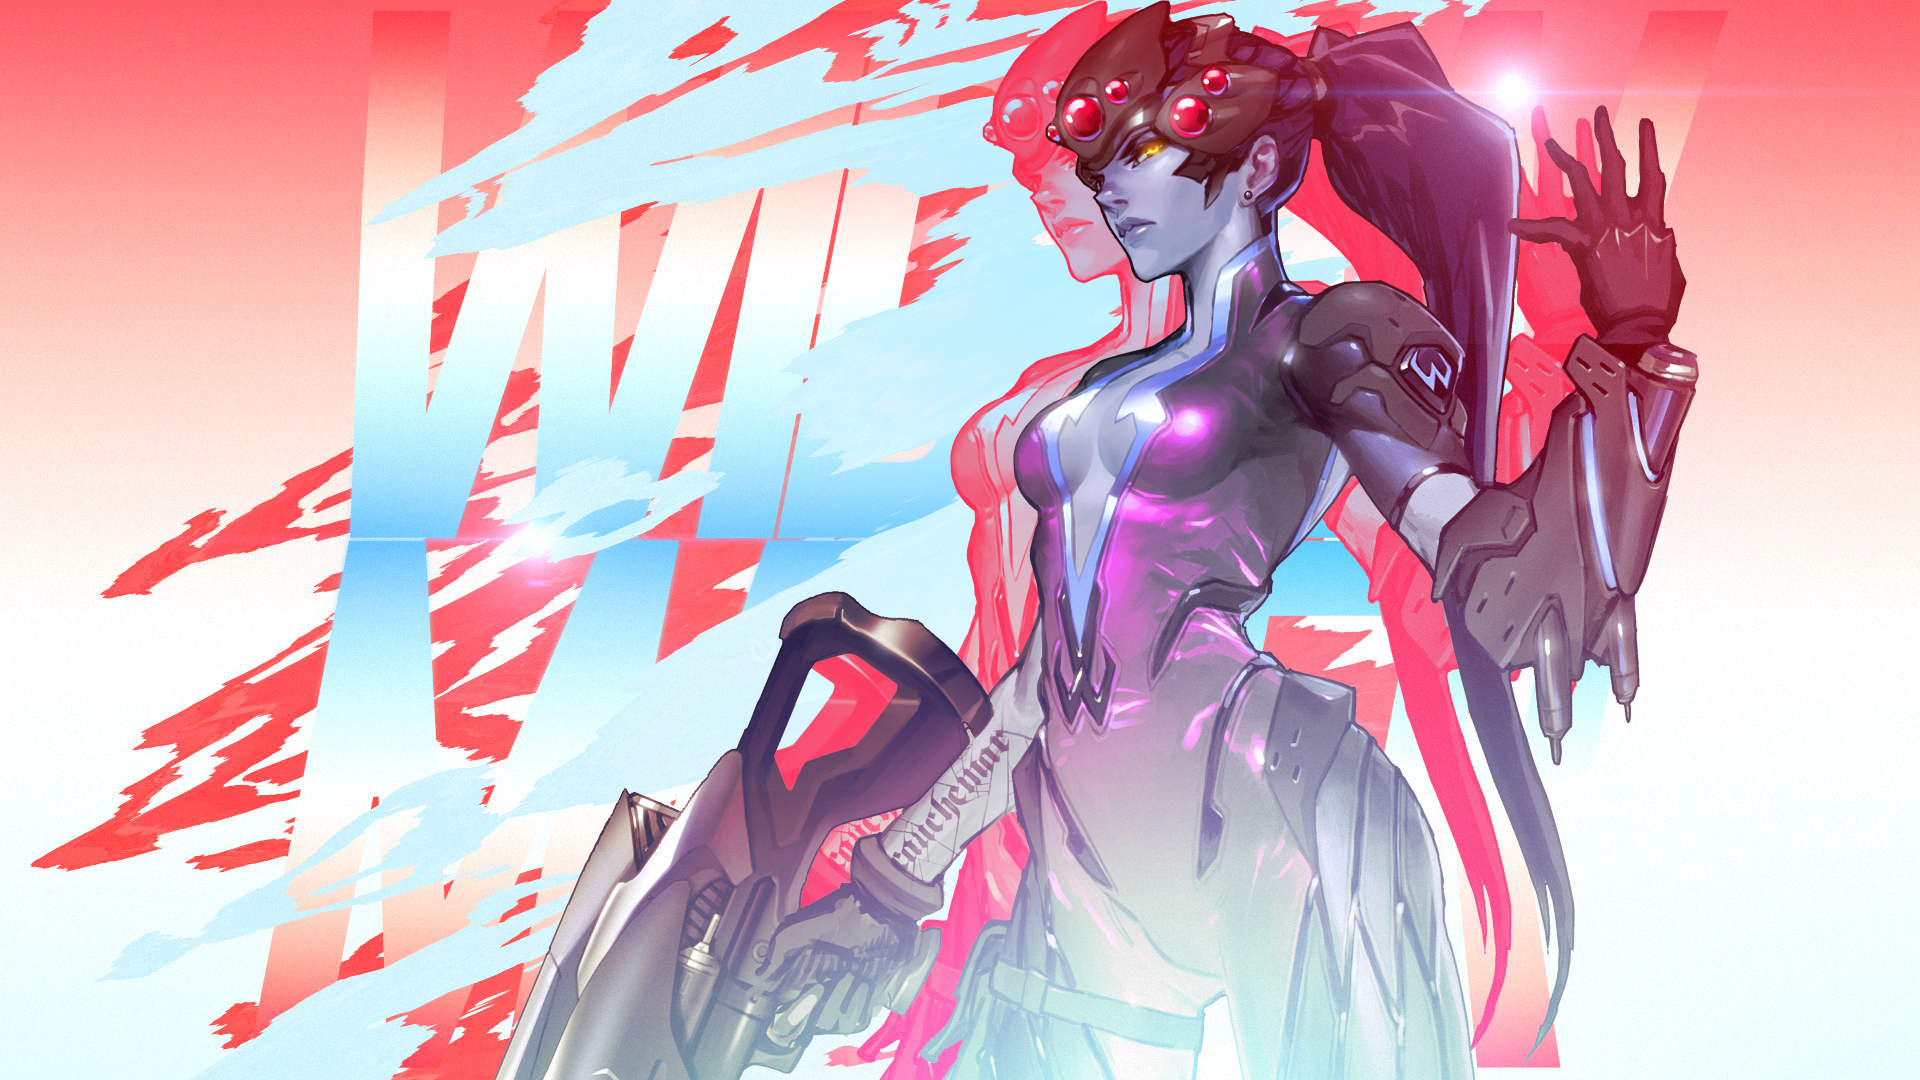 154 Widowmaker (Overwatch) HD Wallpapers Backgrounds